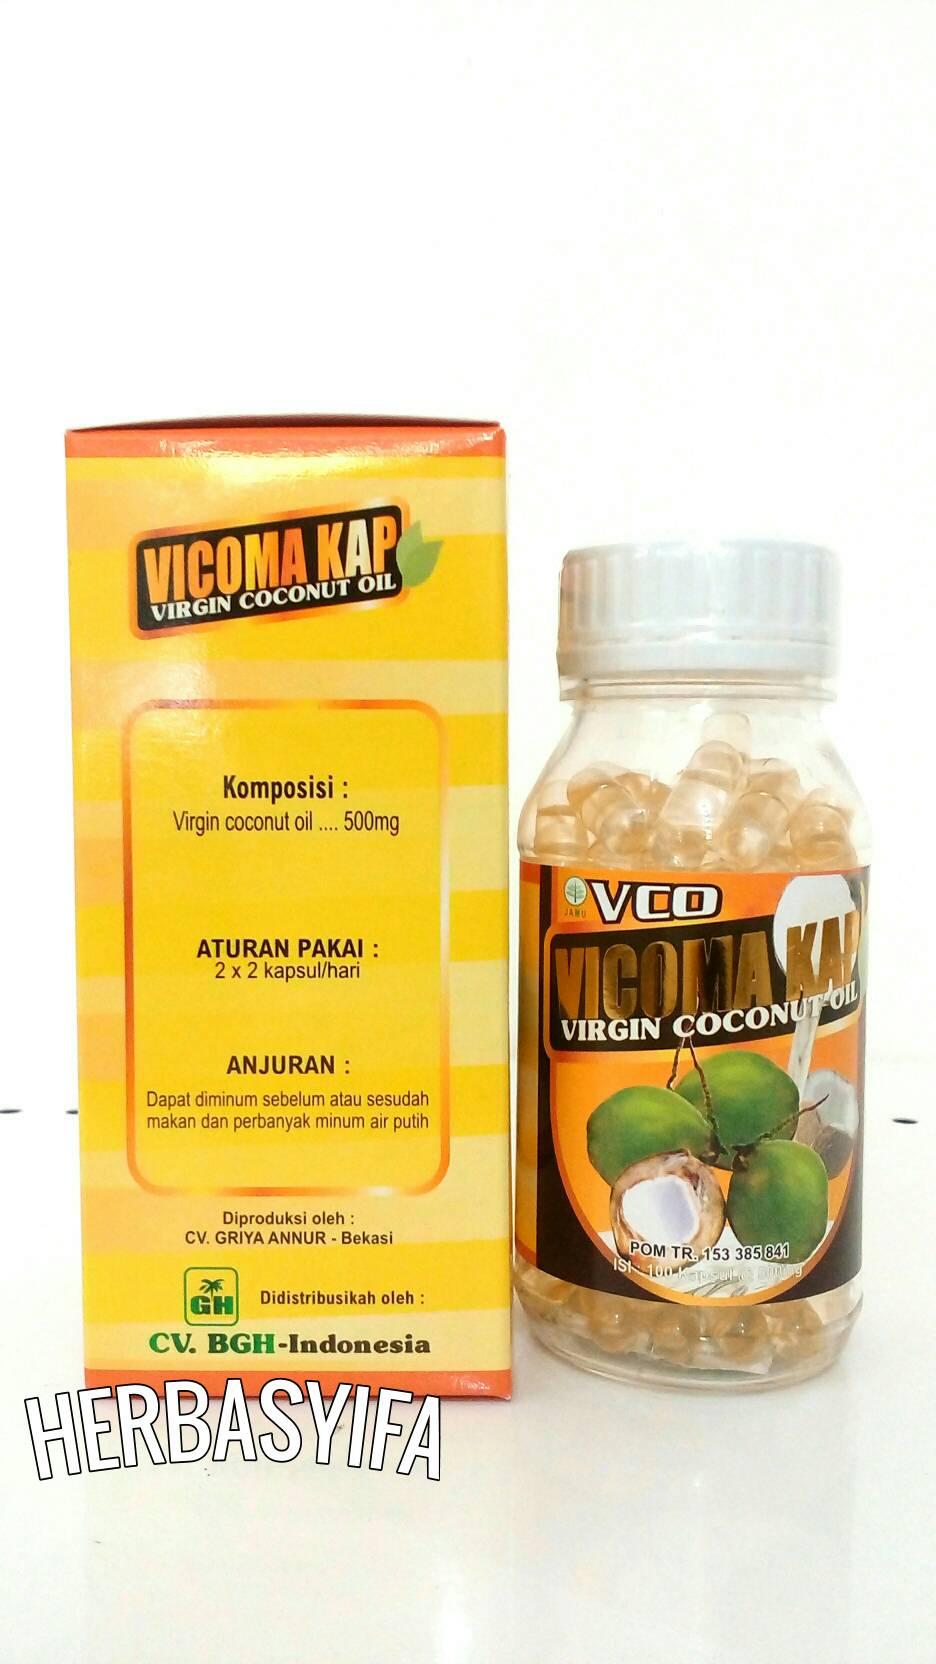 Tazakka Vicoma Virgin Coconut Oil Vco Minyak Kelapa Murni 120ml Kapsul Eza Source Jual Kap 100 Herbasyifa